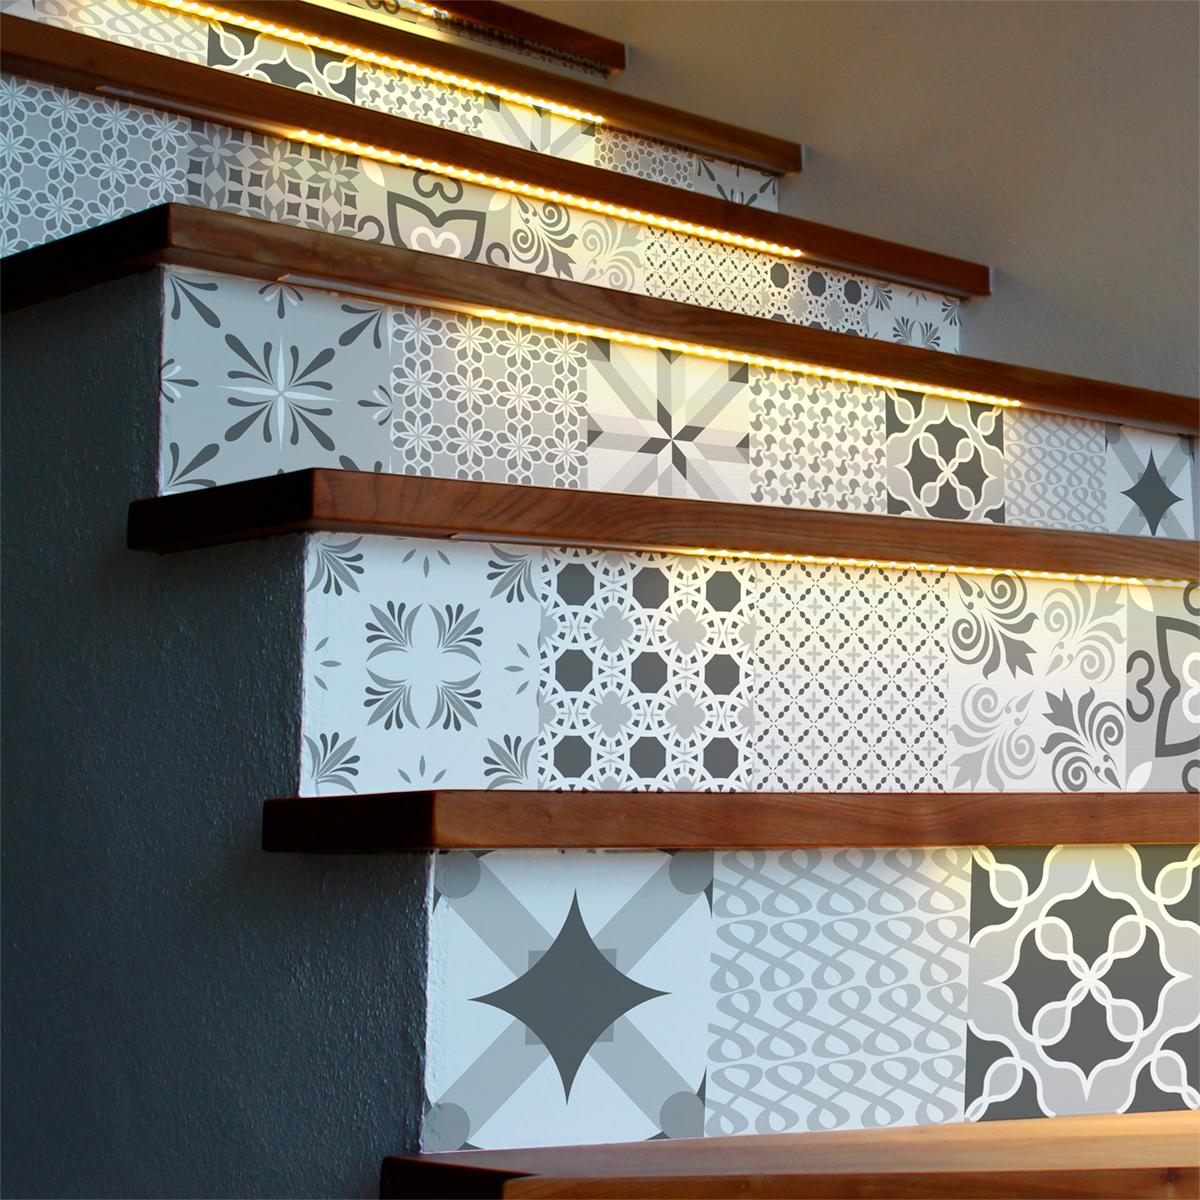 stickers escalier carrelages nuance de gris romantique x 2 ambiance sticker col stairs ros a924. Black Bedroom Furniture Sets. Home Design Ideas